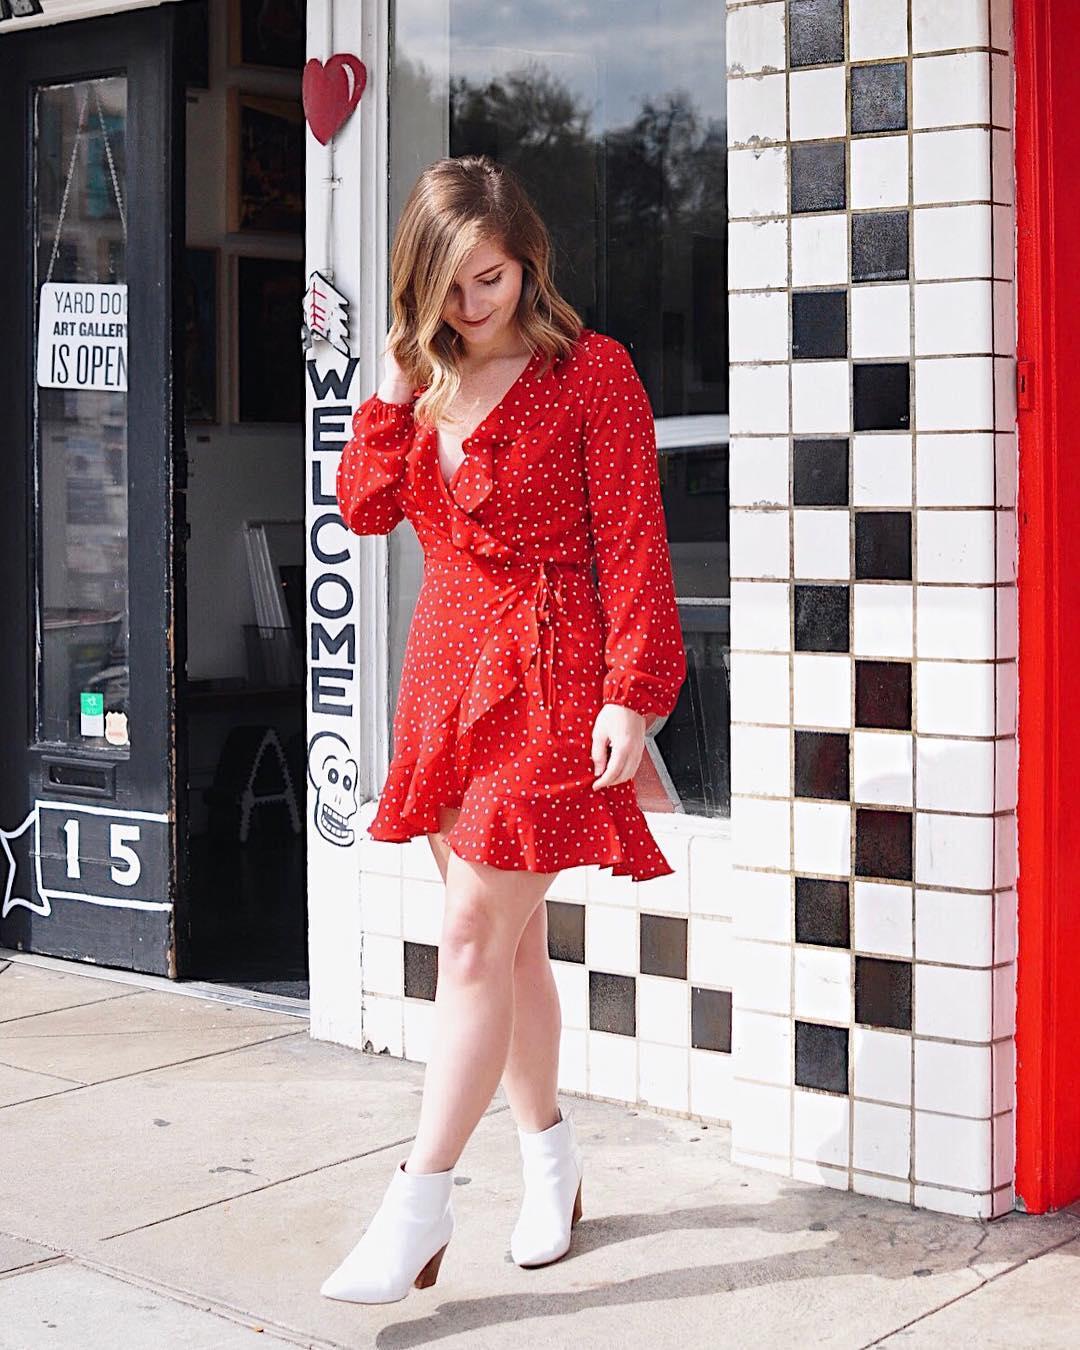 Ruffled Wrap Dress for Spring Formal